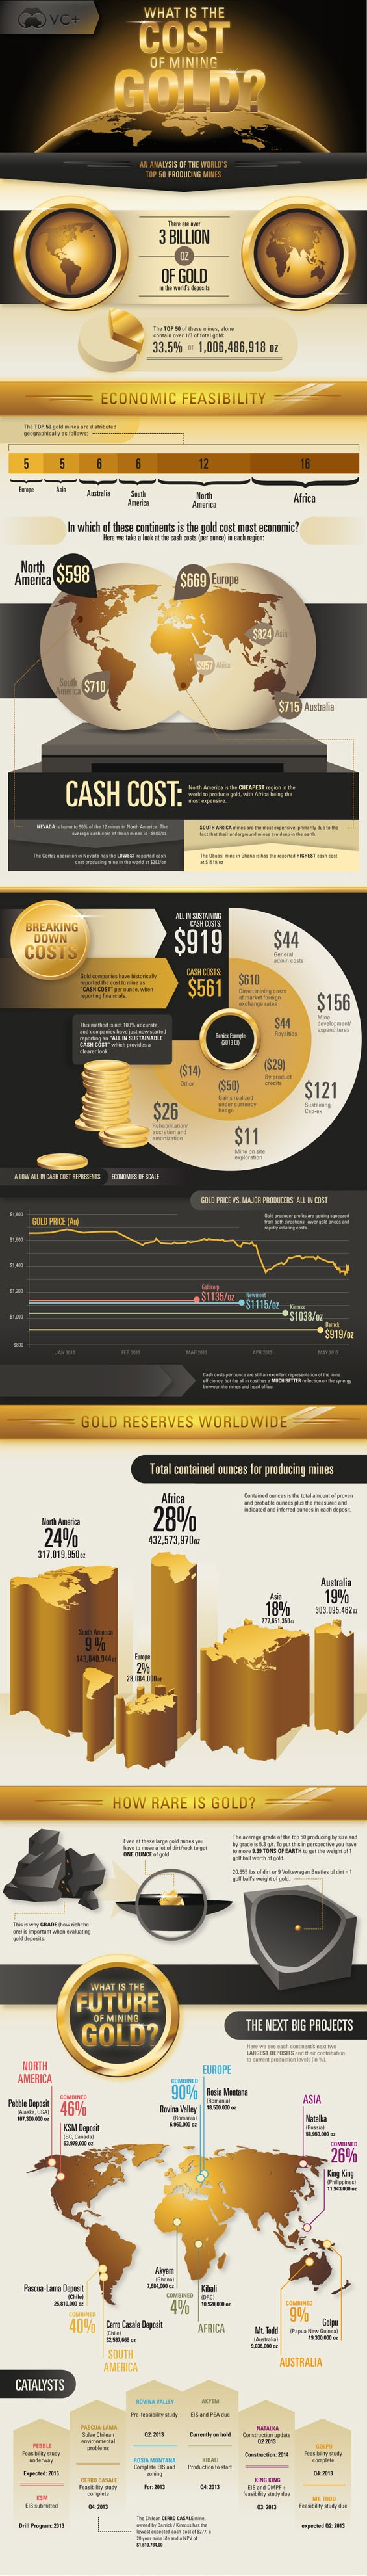 Visual Capitalist infografikája; Conclude Zrt.